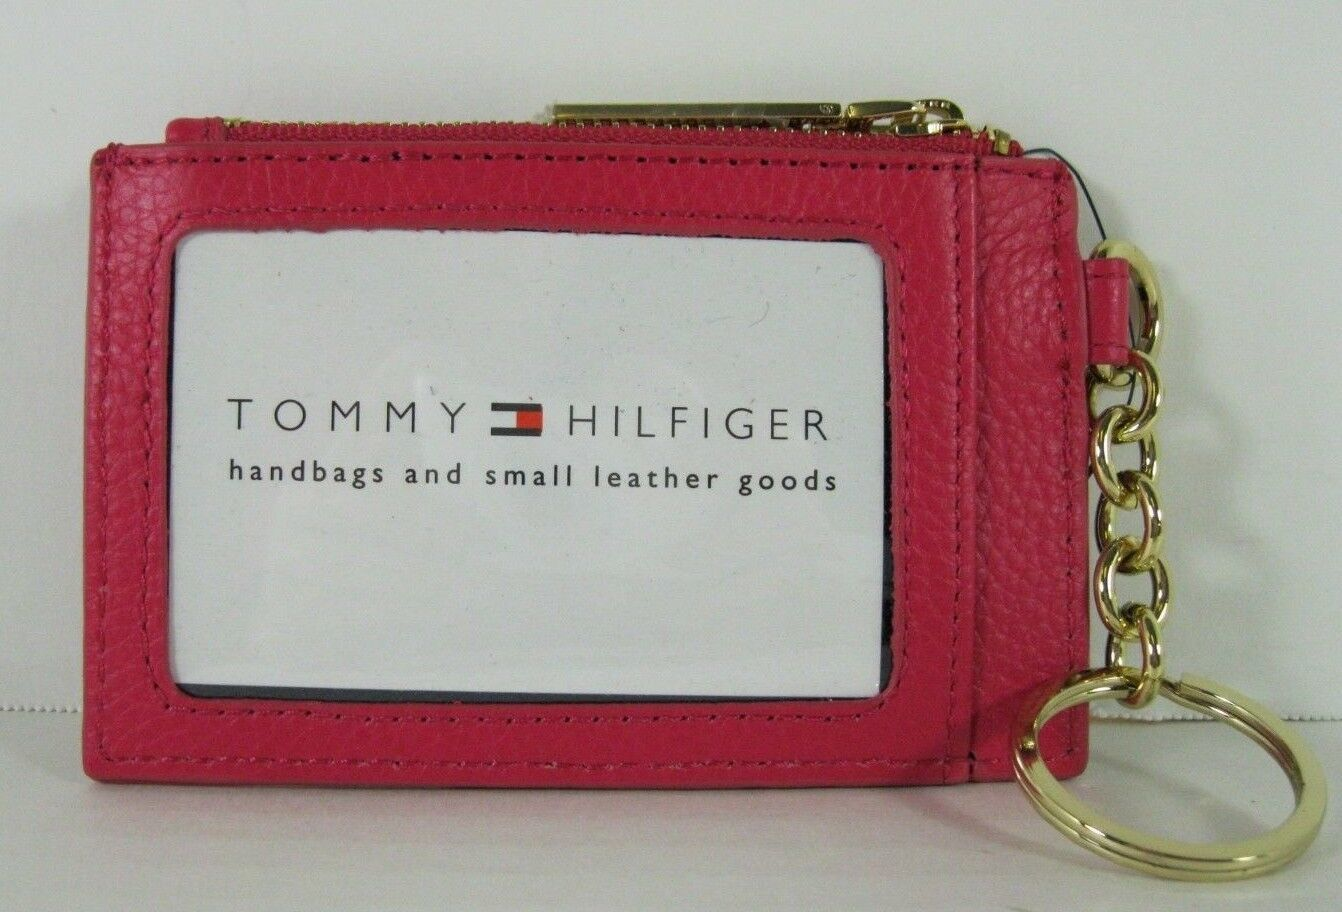 Tommy Hilfiger Nwt Lucky Charm Étiquette Rose Rose Cuir Id Porte-Monnaie Clé Fob image 3